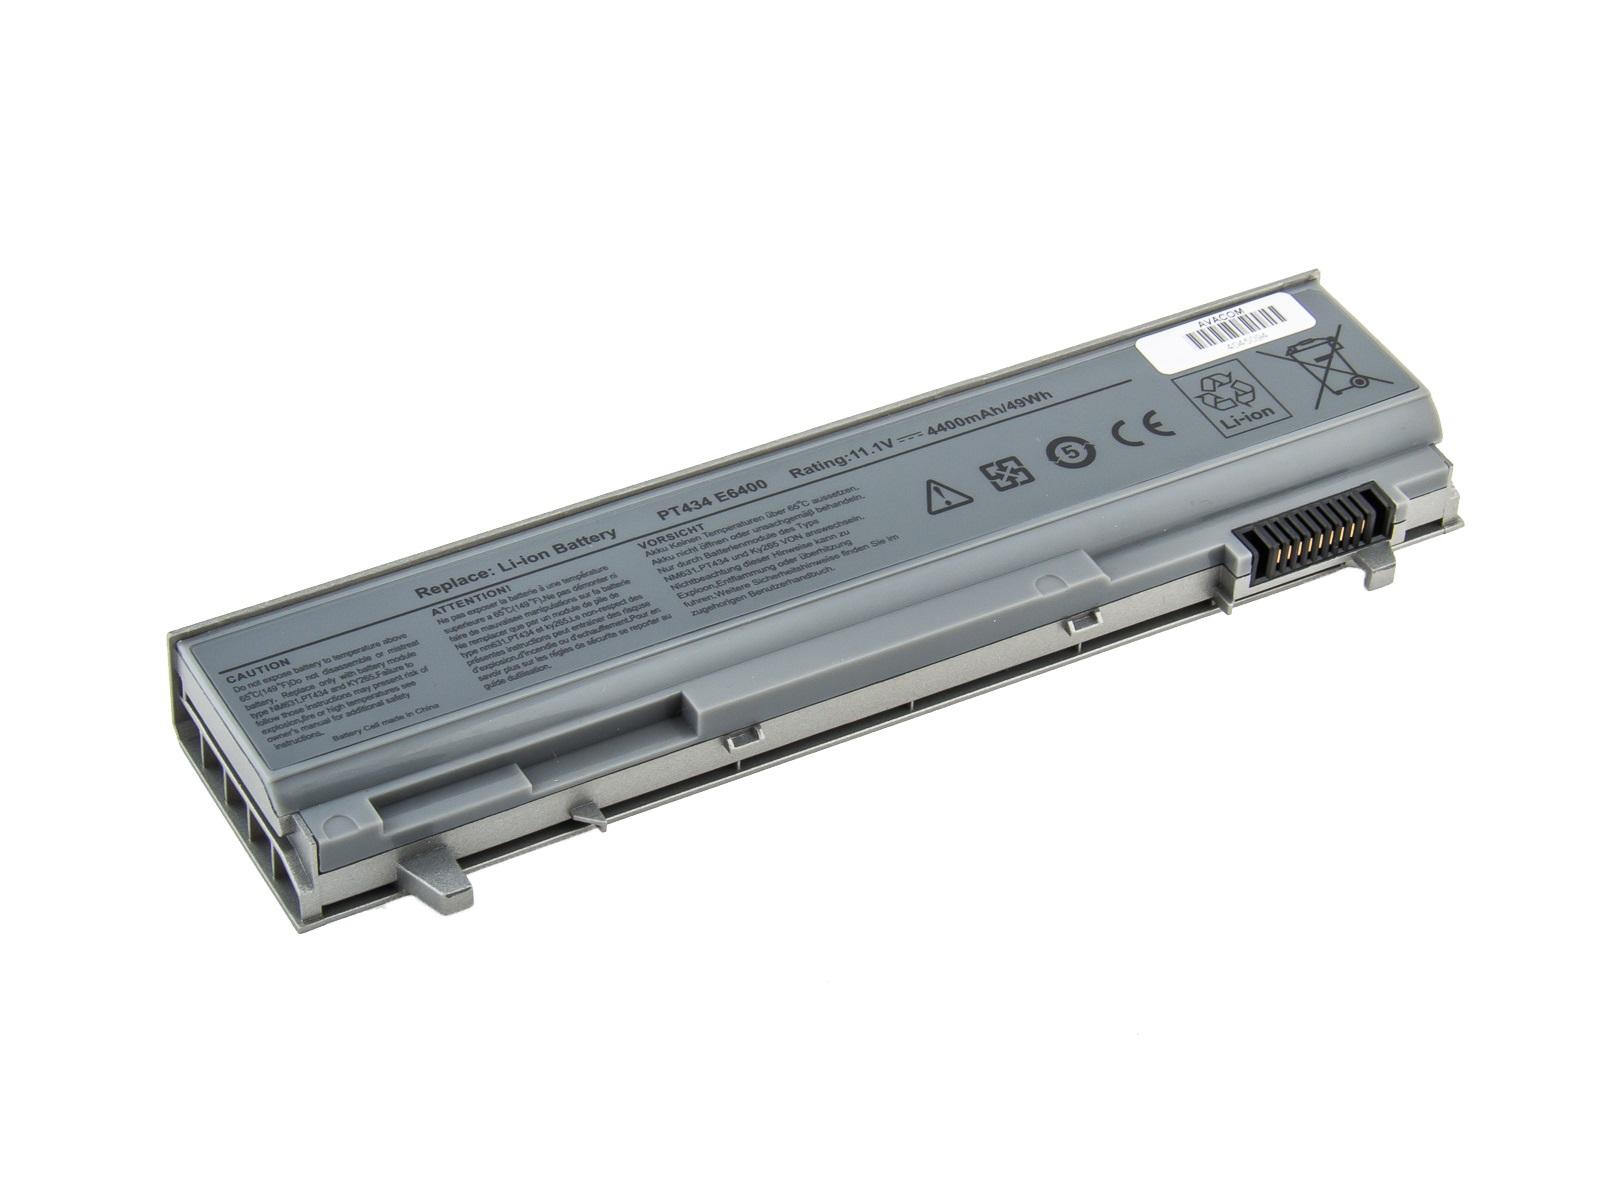 Baterie AVACOM NODE-E64N-N22 pro Dell Latitude E6400, E6410, E6500 Li-Ion 11,1V 4400mAh, NODE-E64N-N22